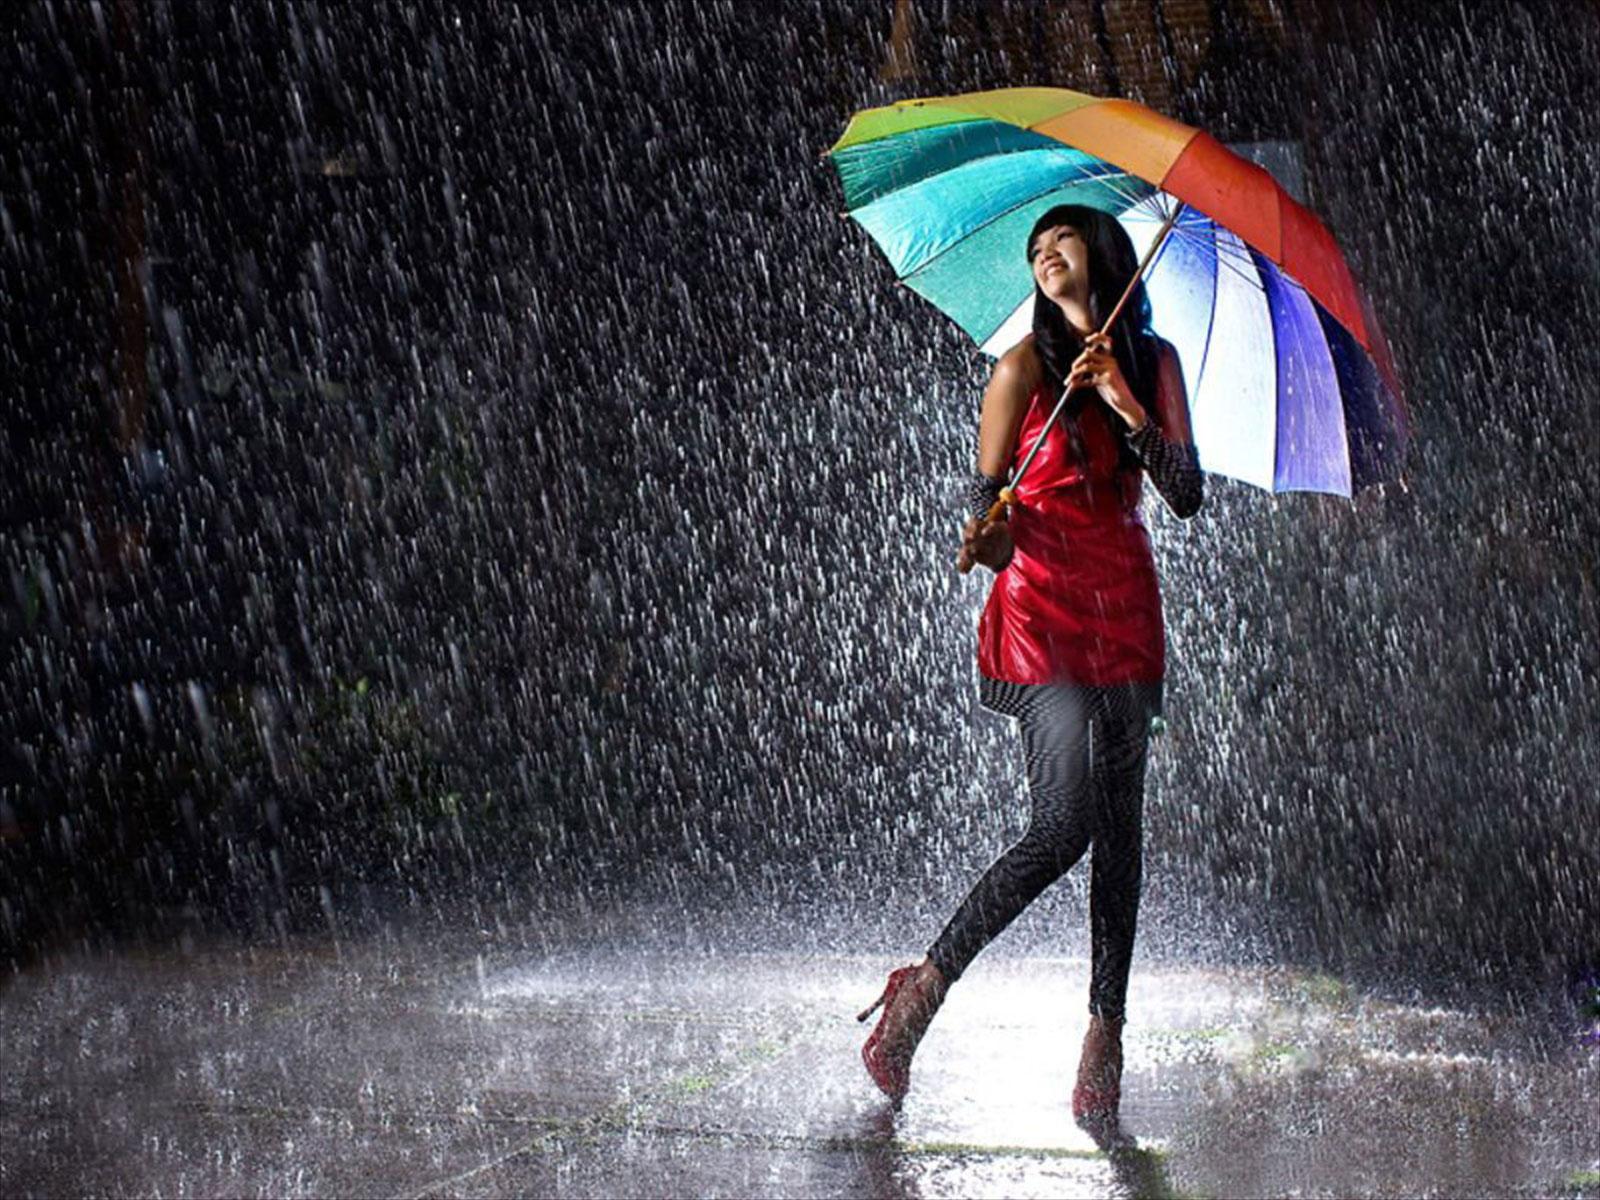 https://1.bp.blogspot.com/-fzOor7DuxBA/T-ln1iOlD3I/AAAAAAAAASo/wjxJaS5IHMg/s1600/Rain-Desktop-Wallpapers-HD-.jpg